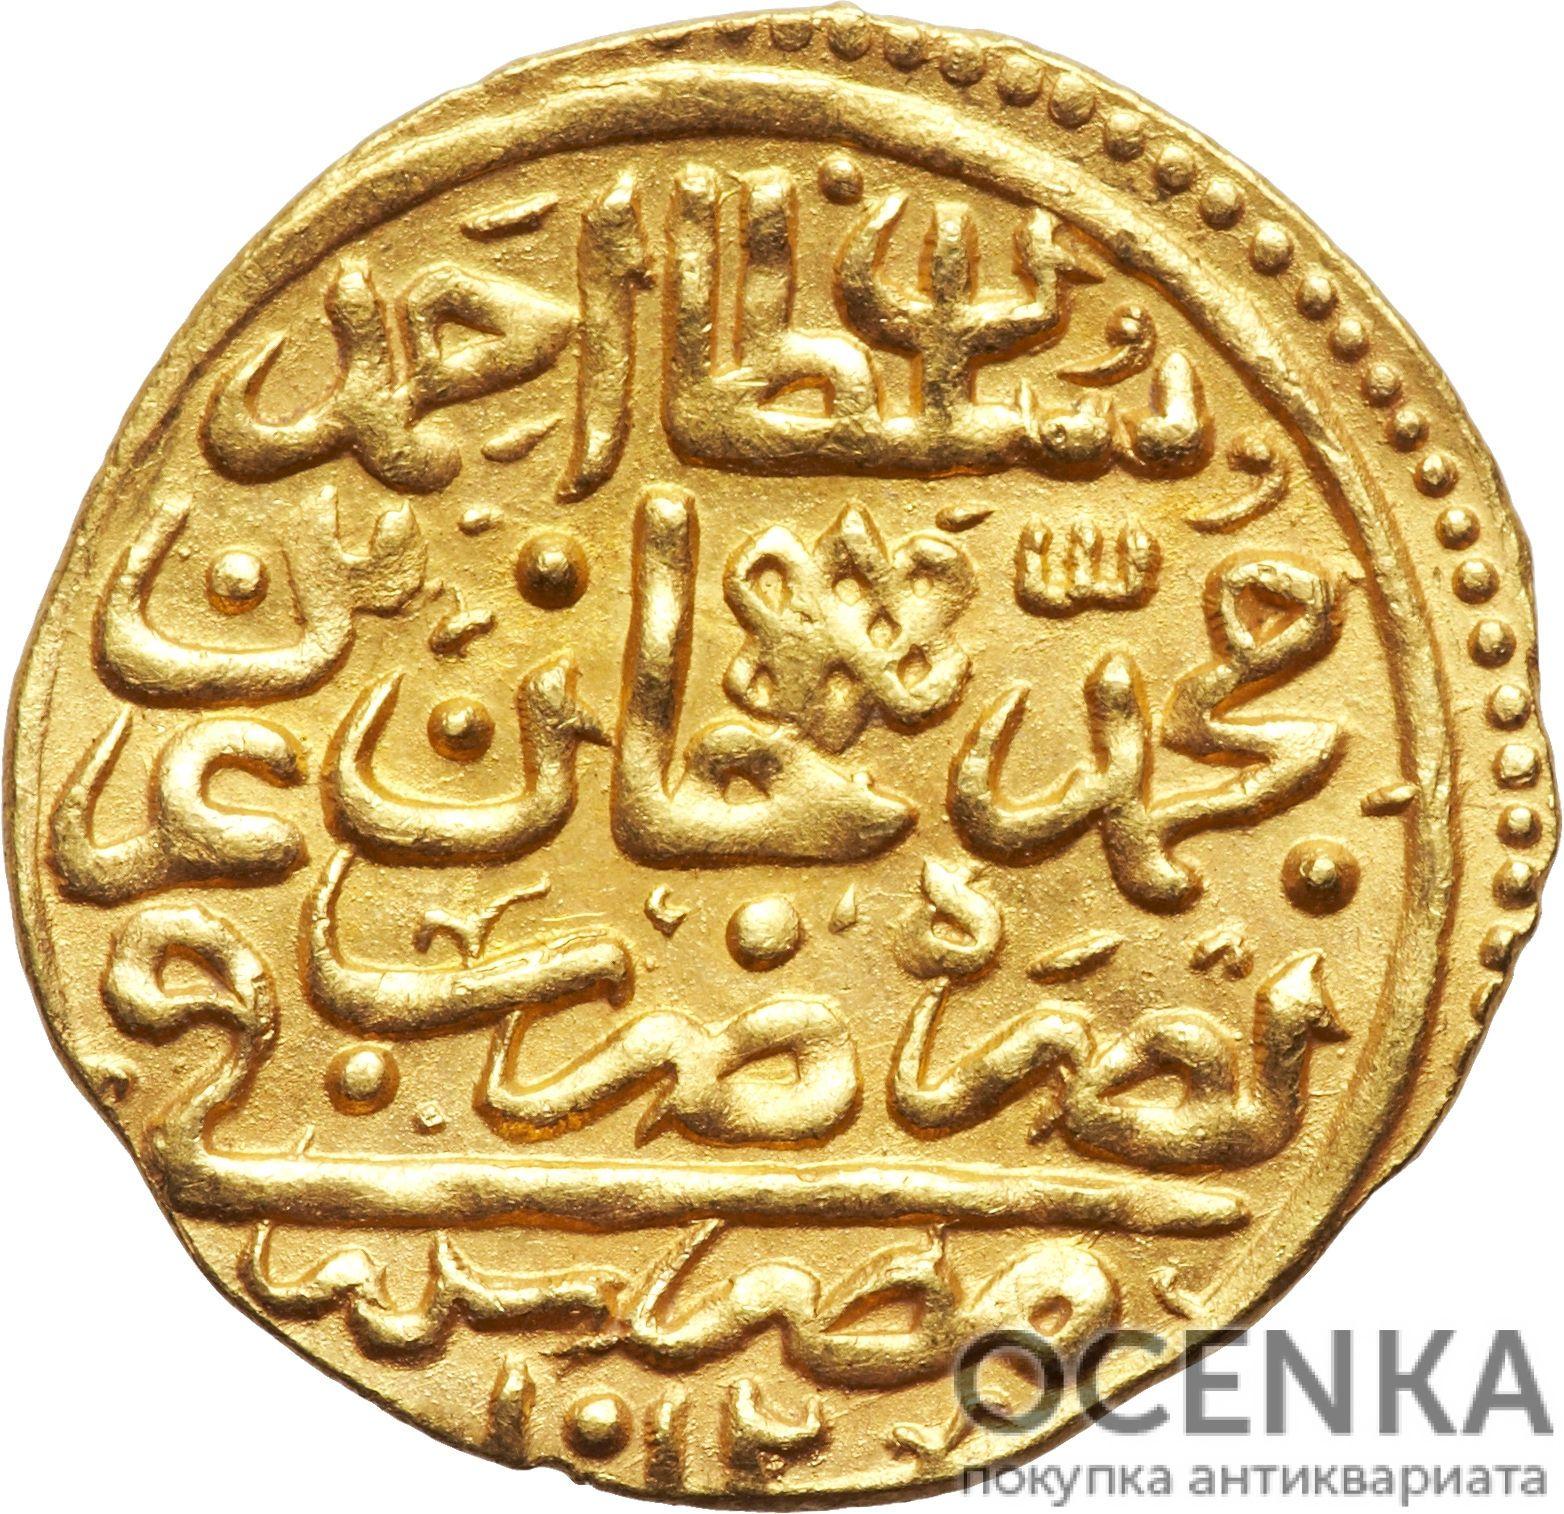 Золотая монета 1 Султани (1 Sultani) Египет - 5